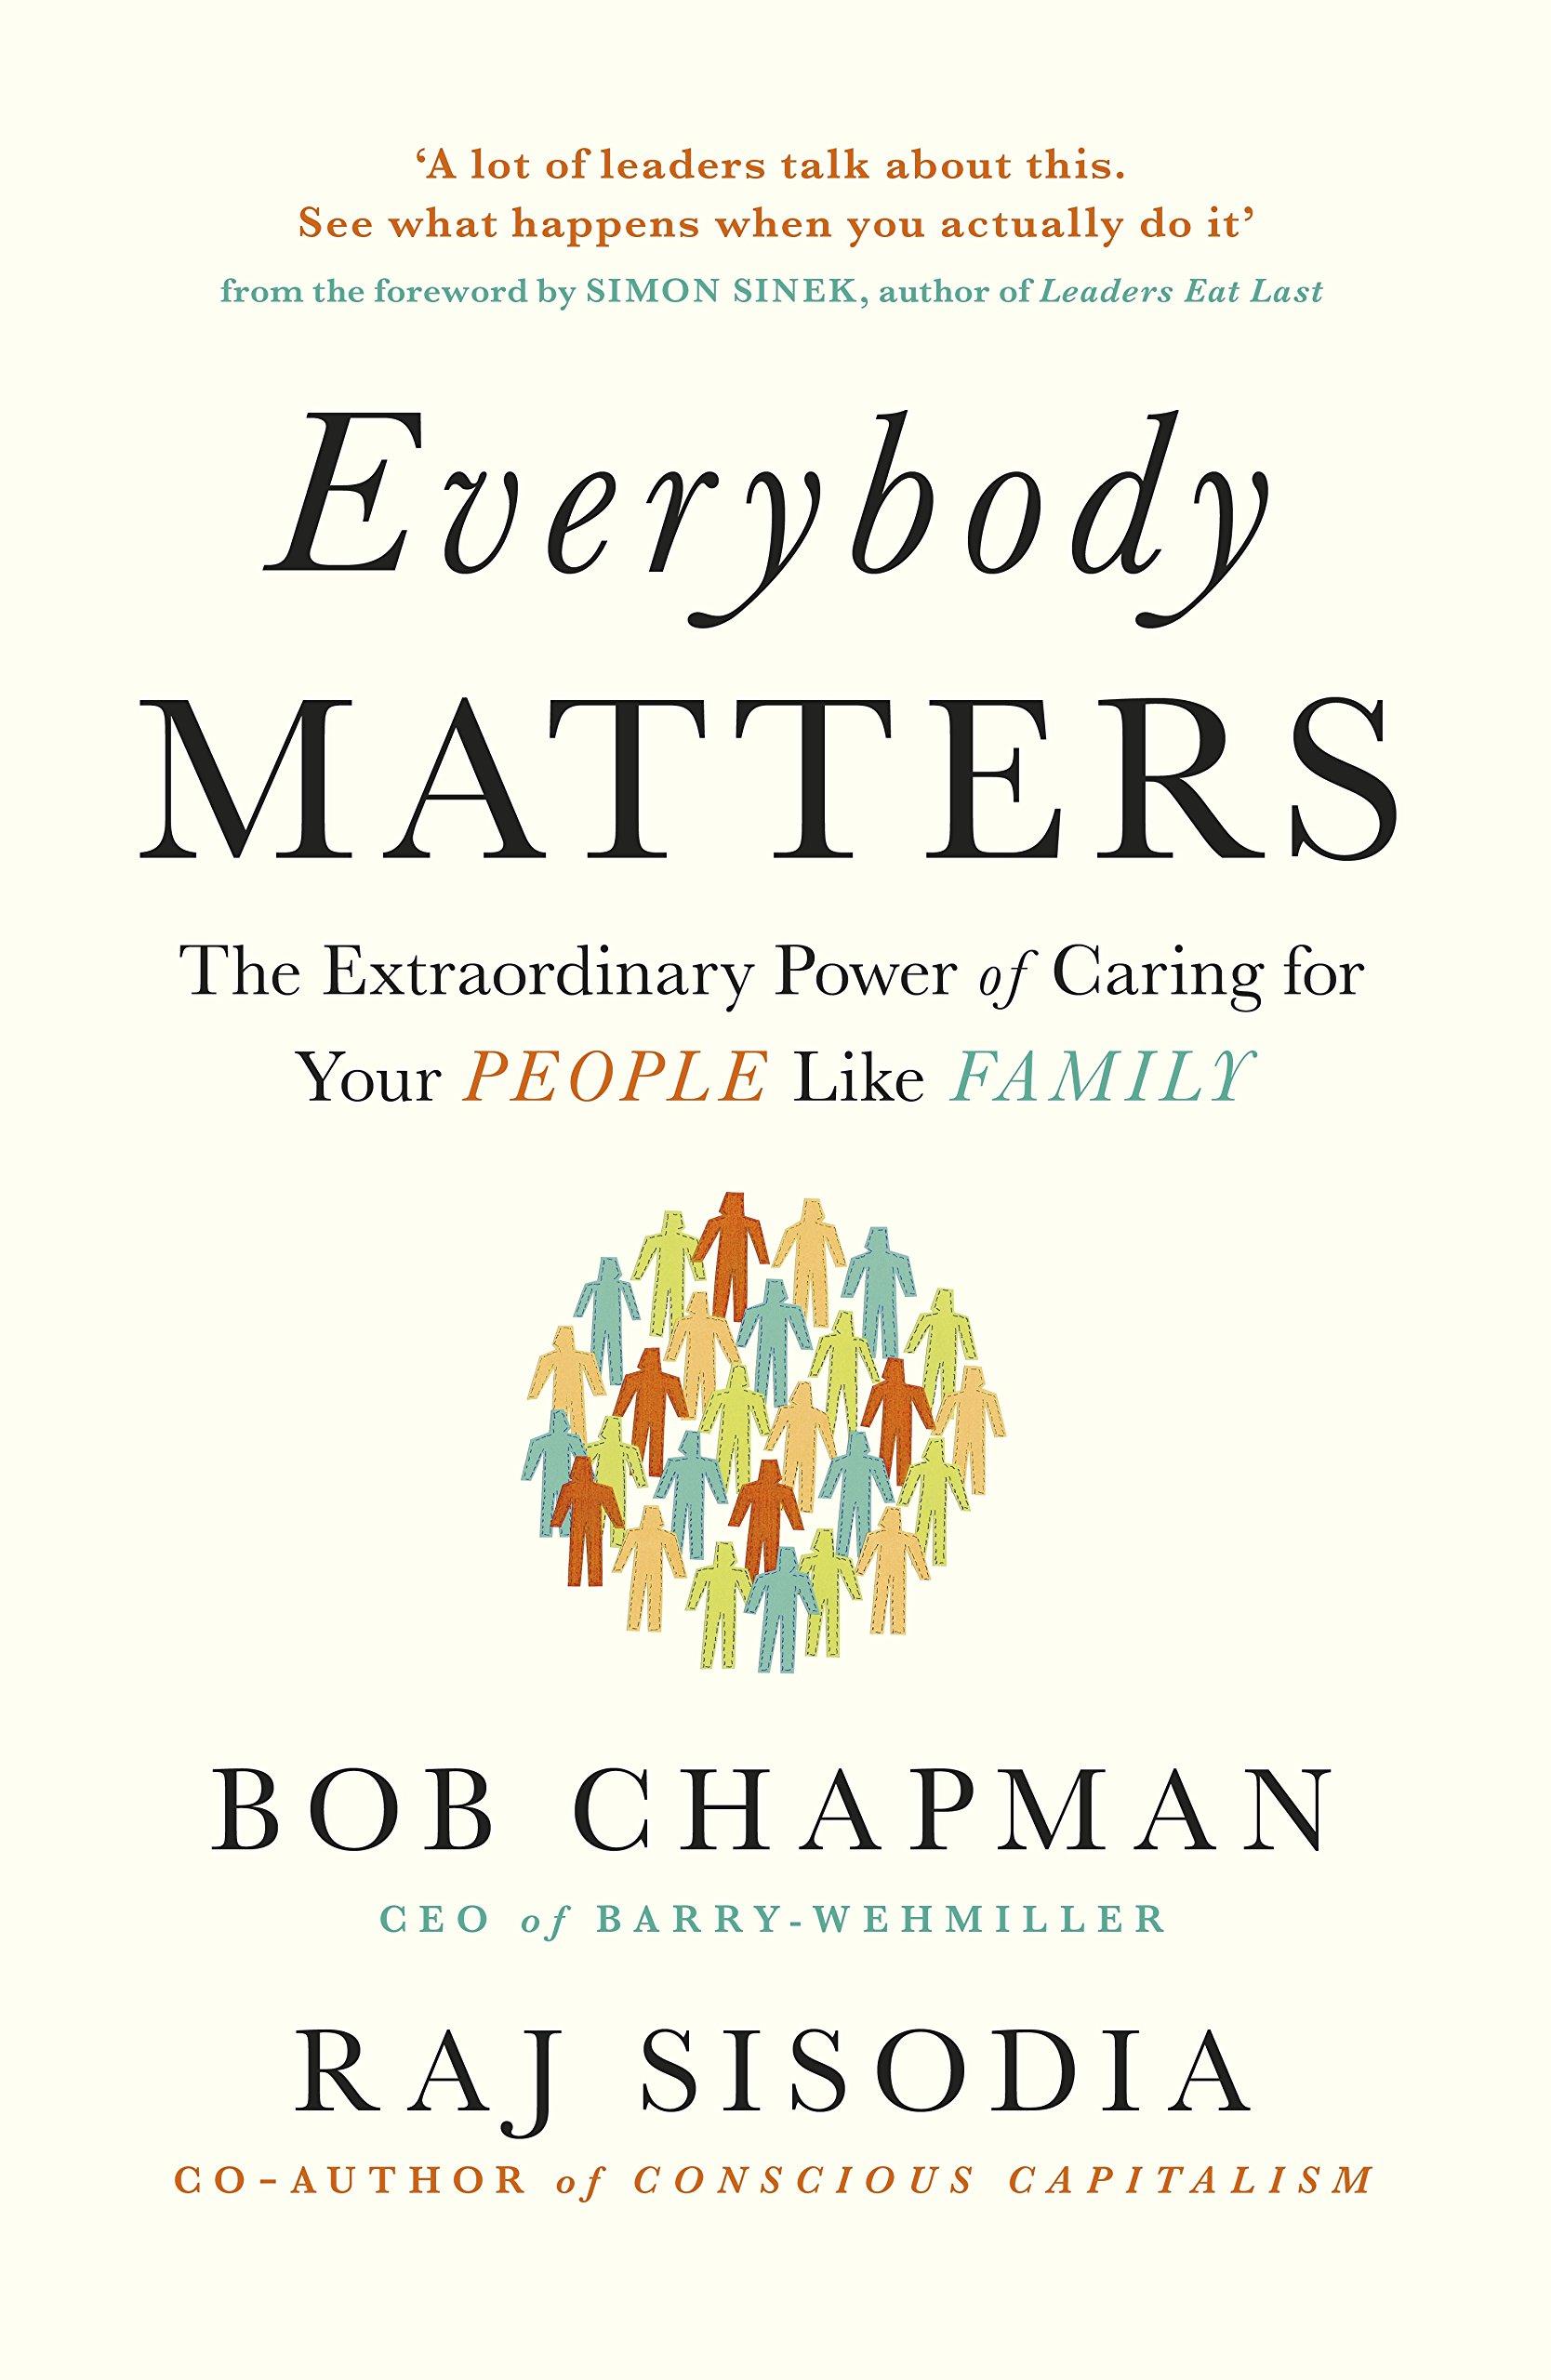 Everybody Matters.